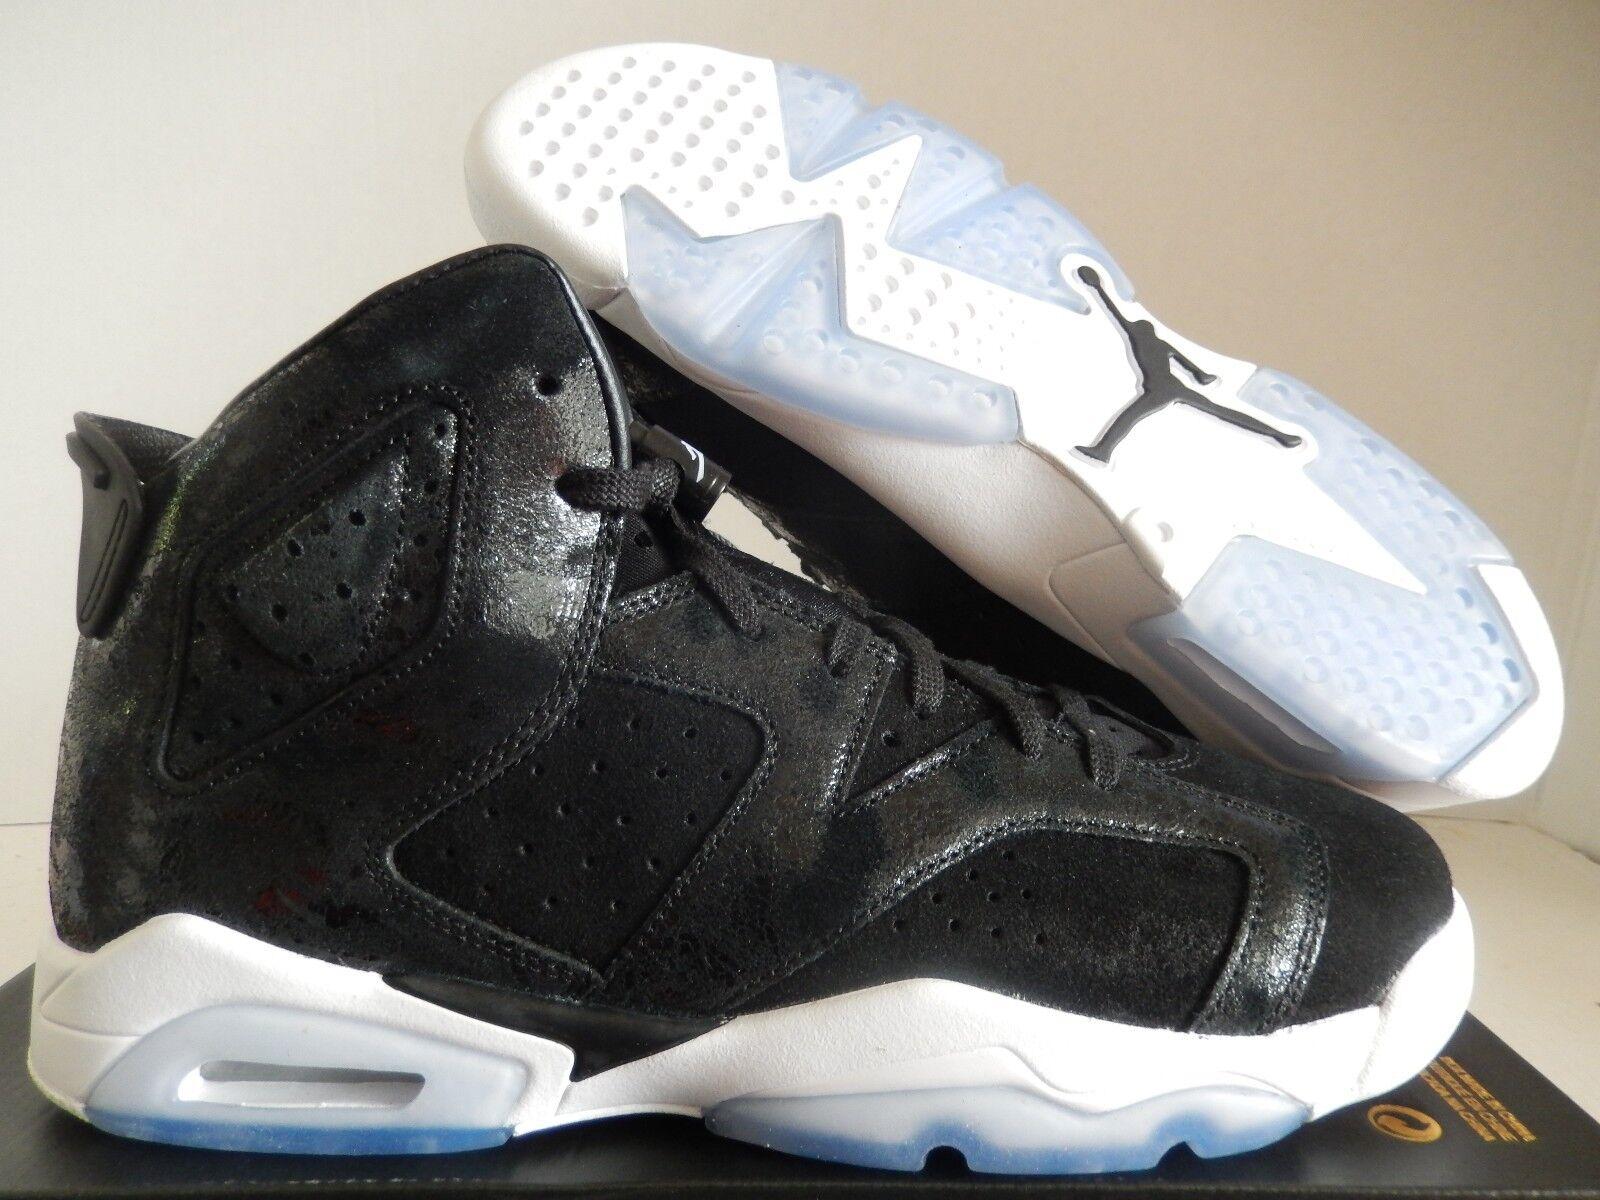 Nike Air Jordan 6 Retro tamaño Premium HC GG heredera tamaño Retro 9YHombres [881430029] d8333c